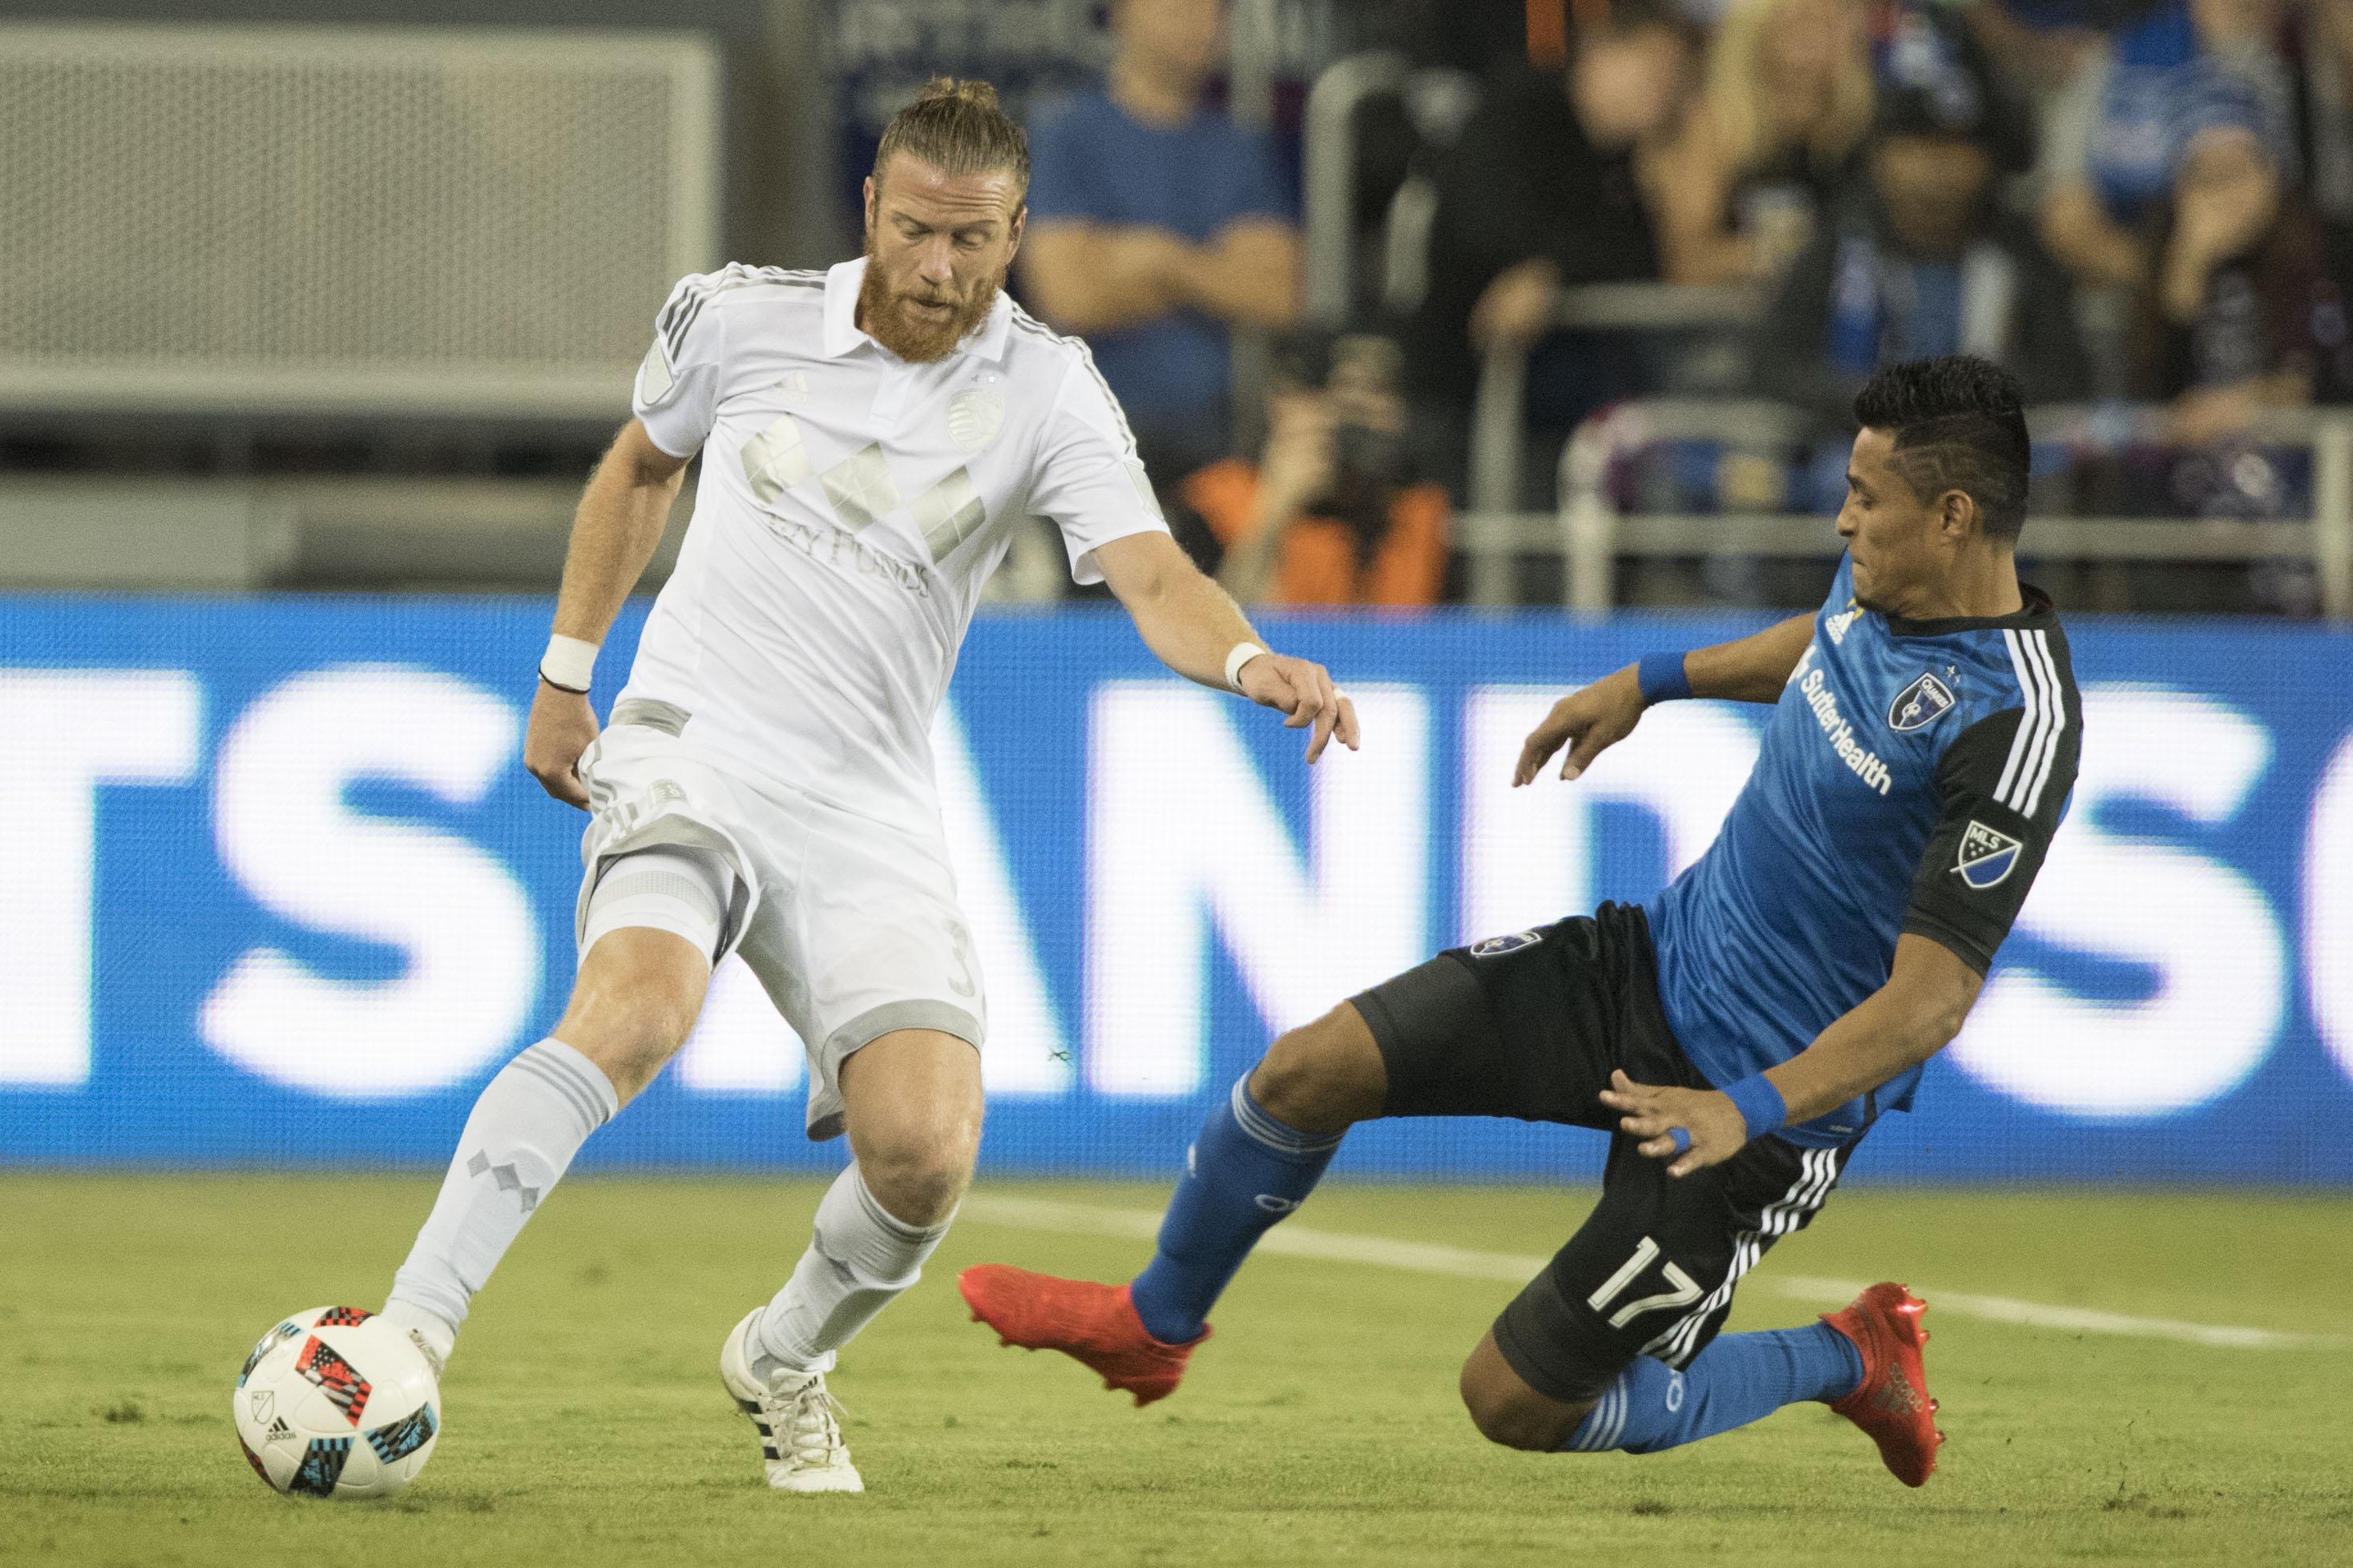 MLS: Sporting KC at San Jose Earthquakes